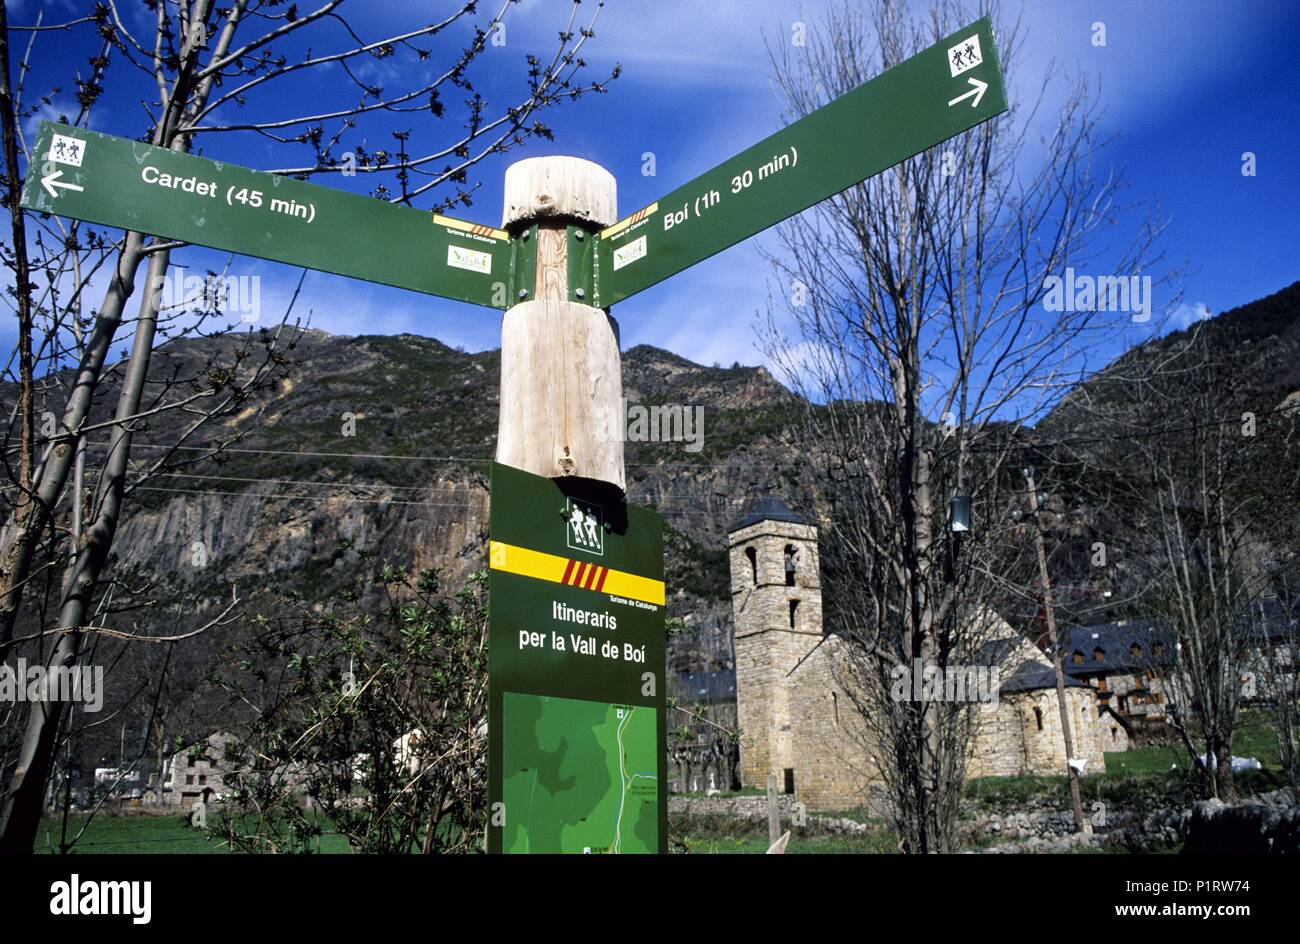 Alta Ribagorça: Barruera, romanesque church and treking signposting (Vall de Boí-Alta Ribagorça / Ribagorza). - Stock Image